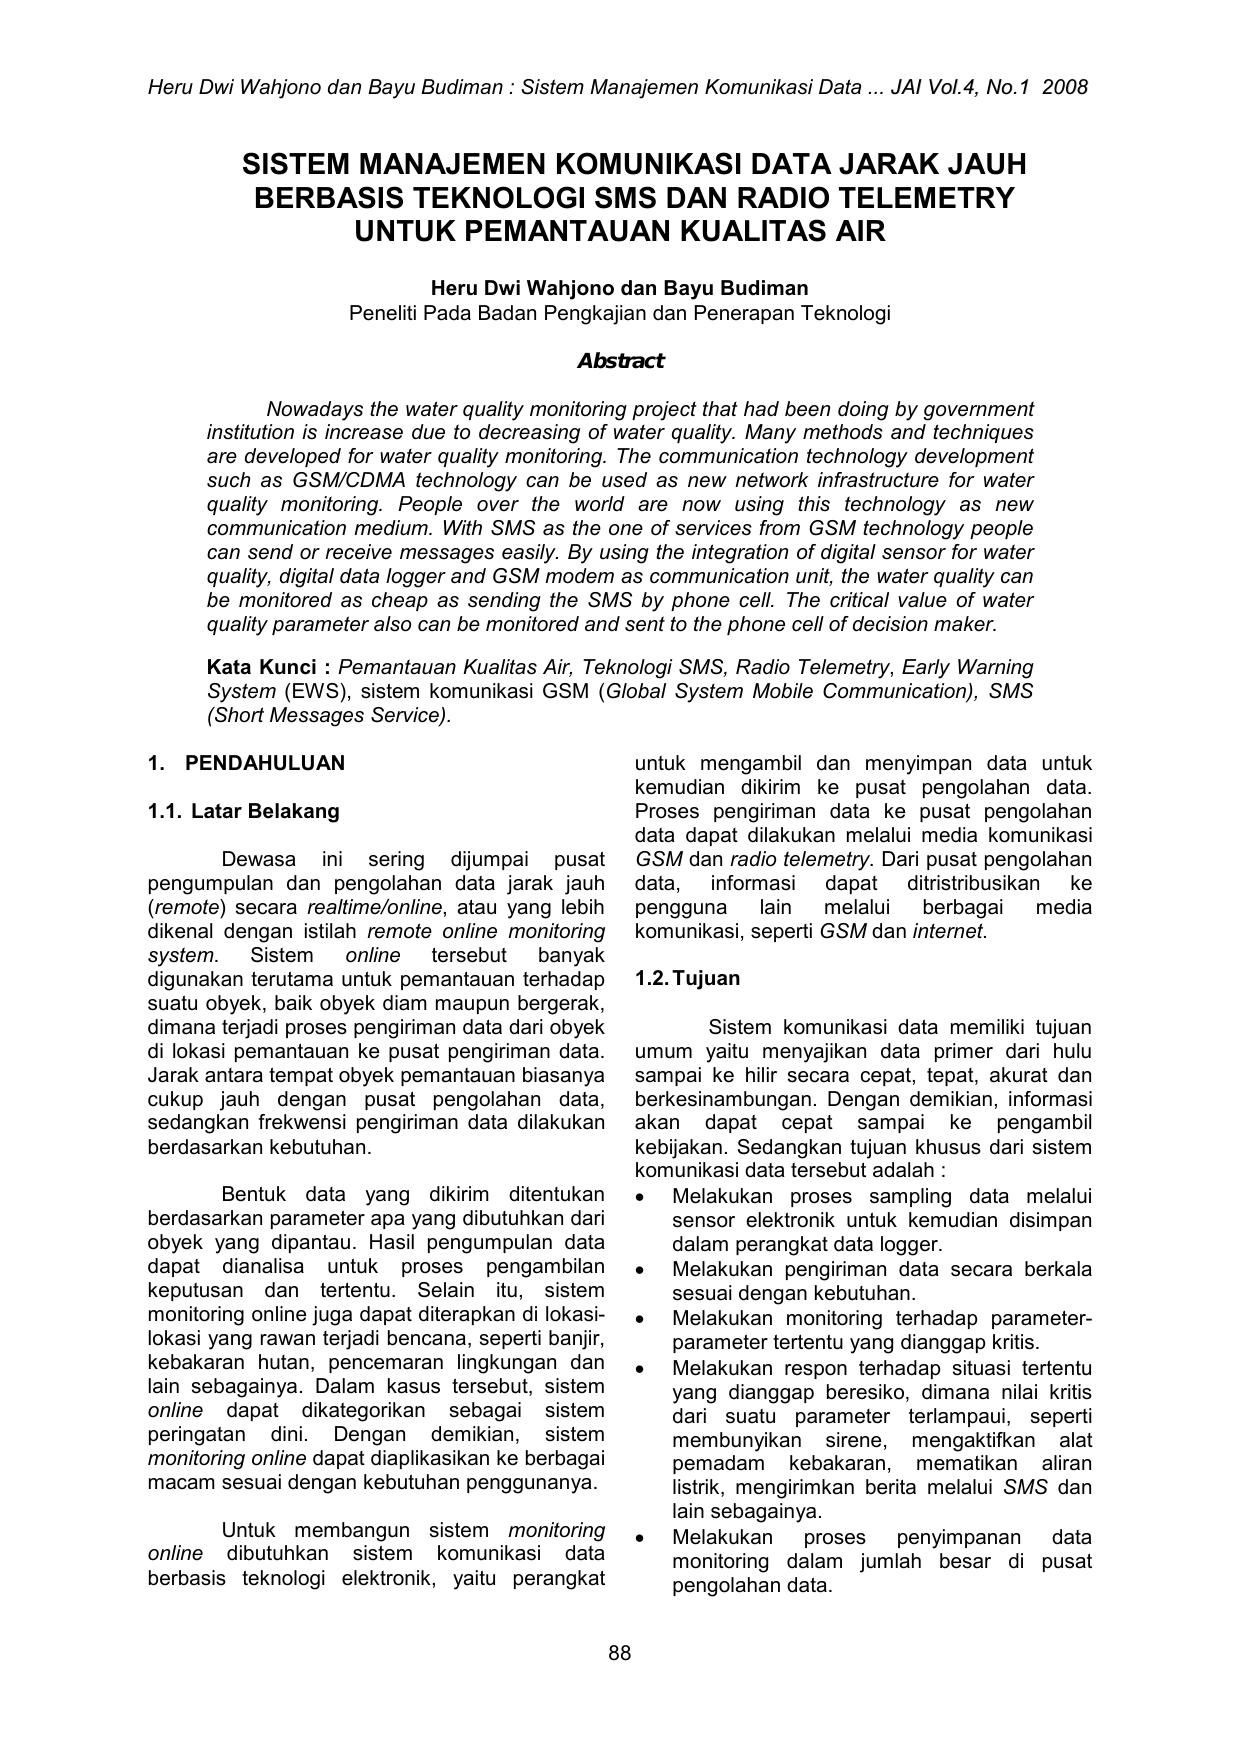 Format Penulisan Artikel Untuk Jurnal Teknologi Lingkungan